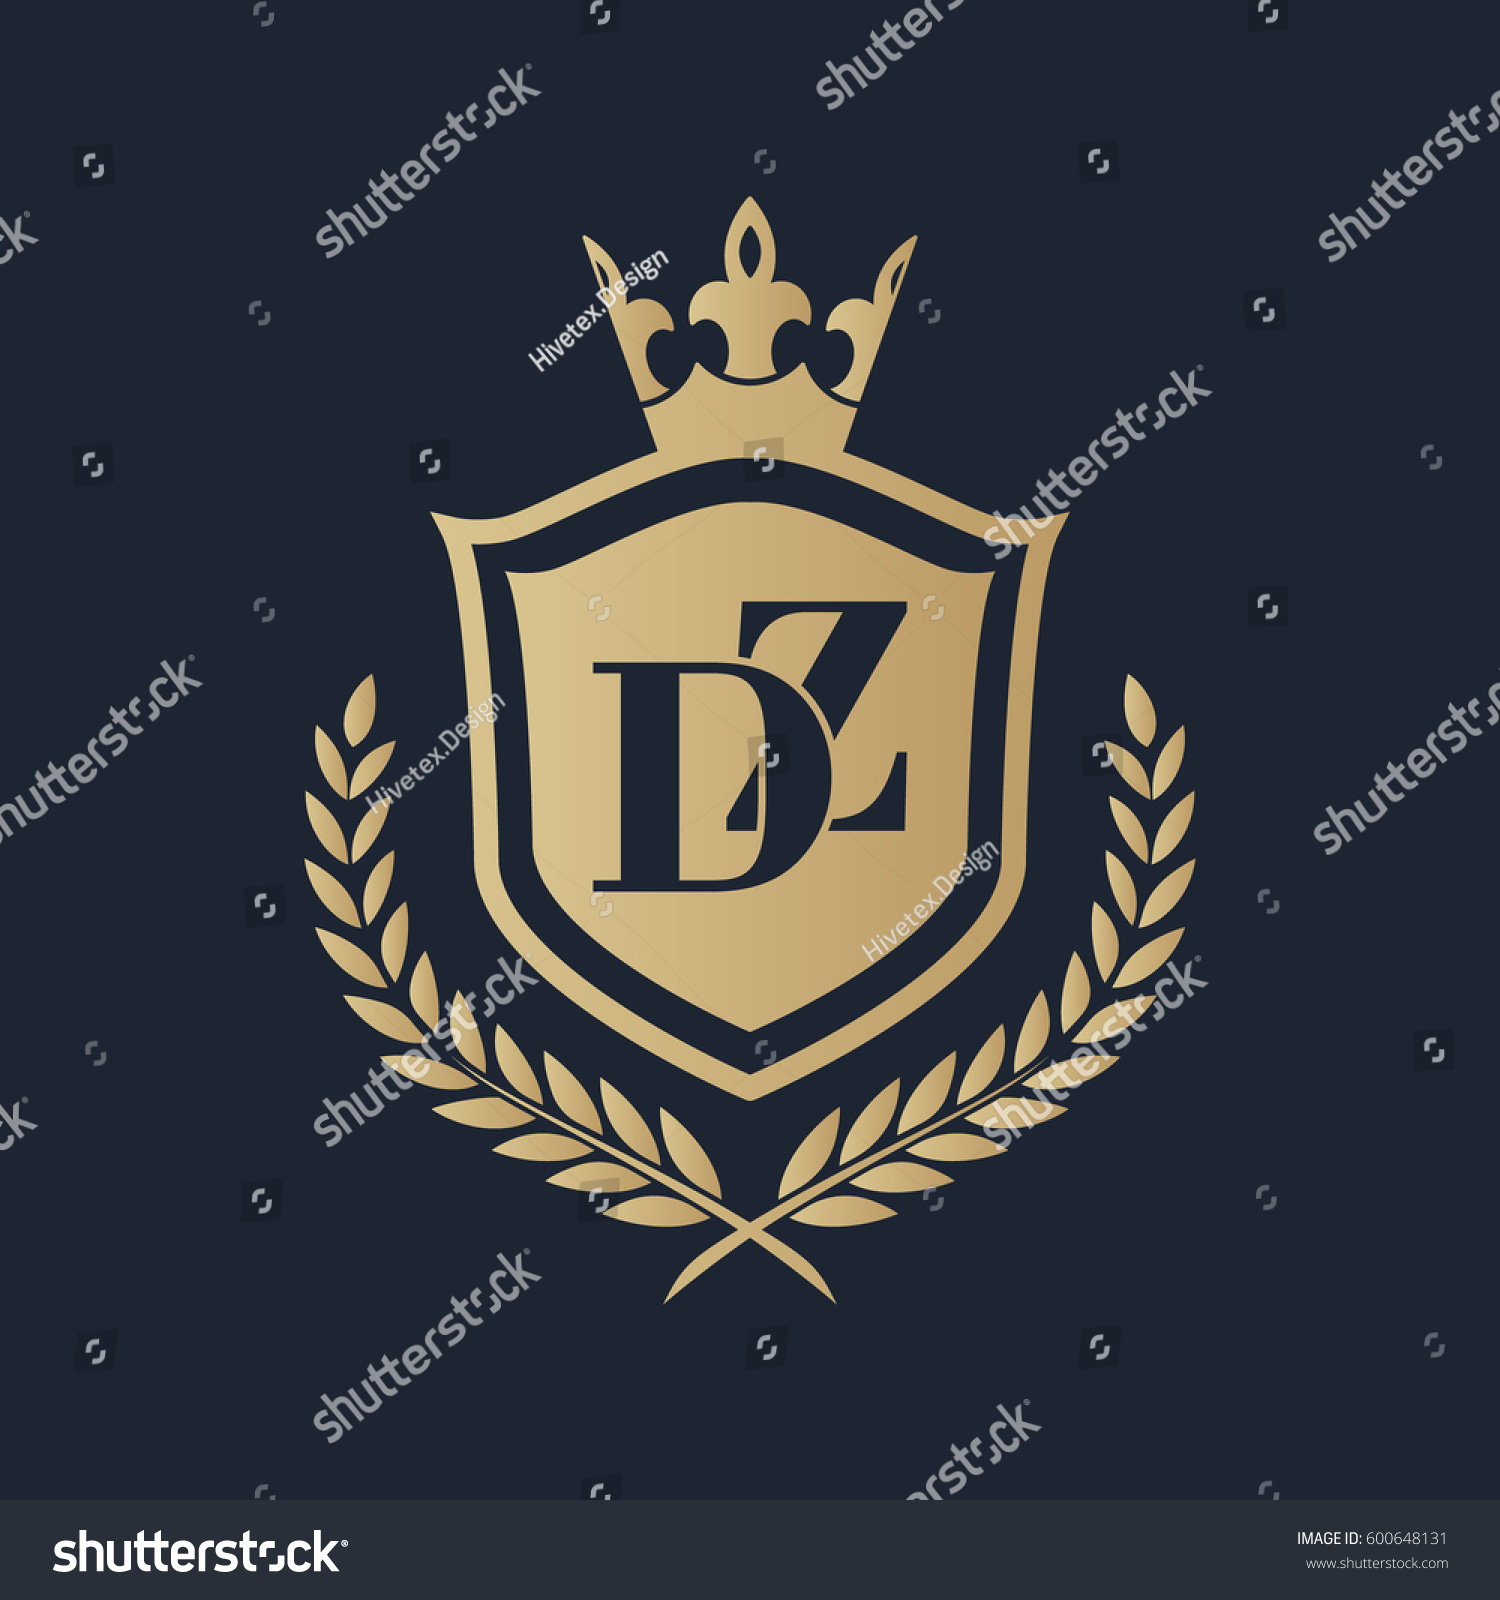 Dz >> Dz Logo Stock Vector Royalty Free 600648131 Shutterstock